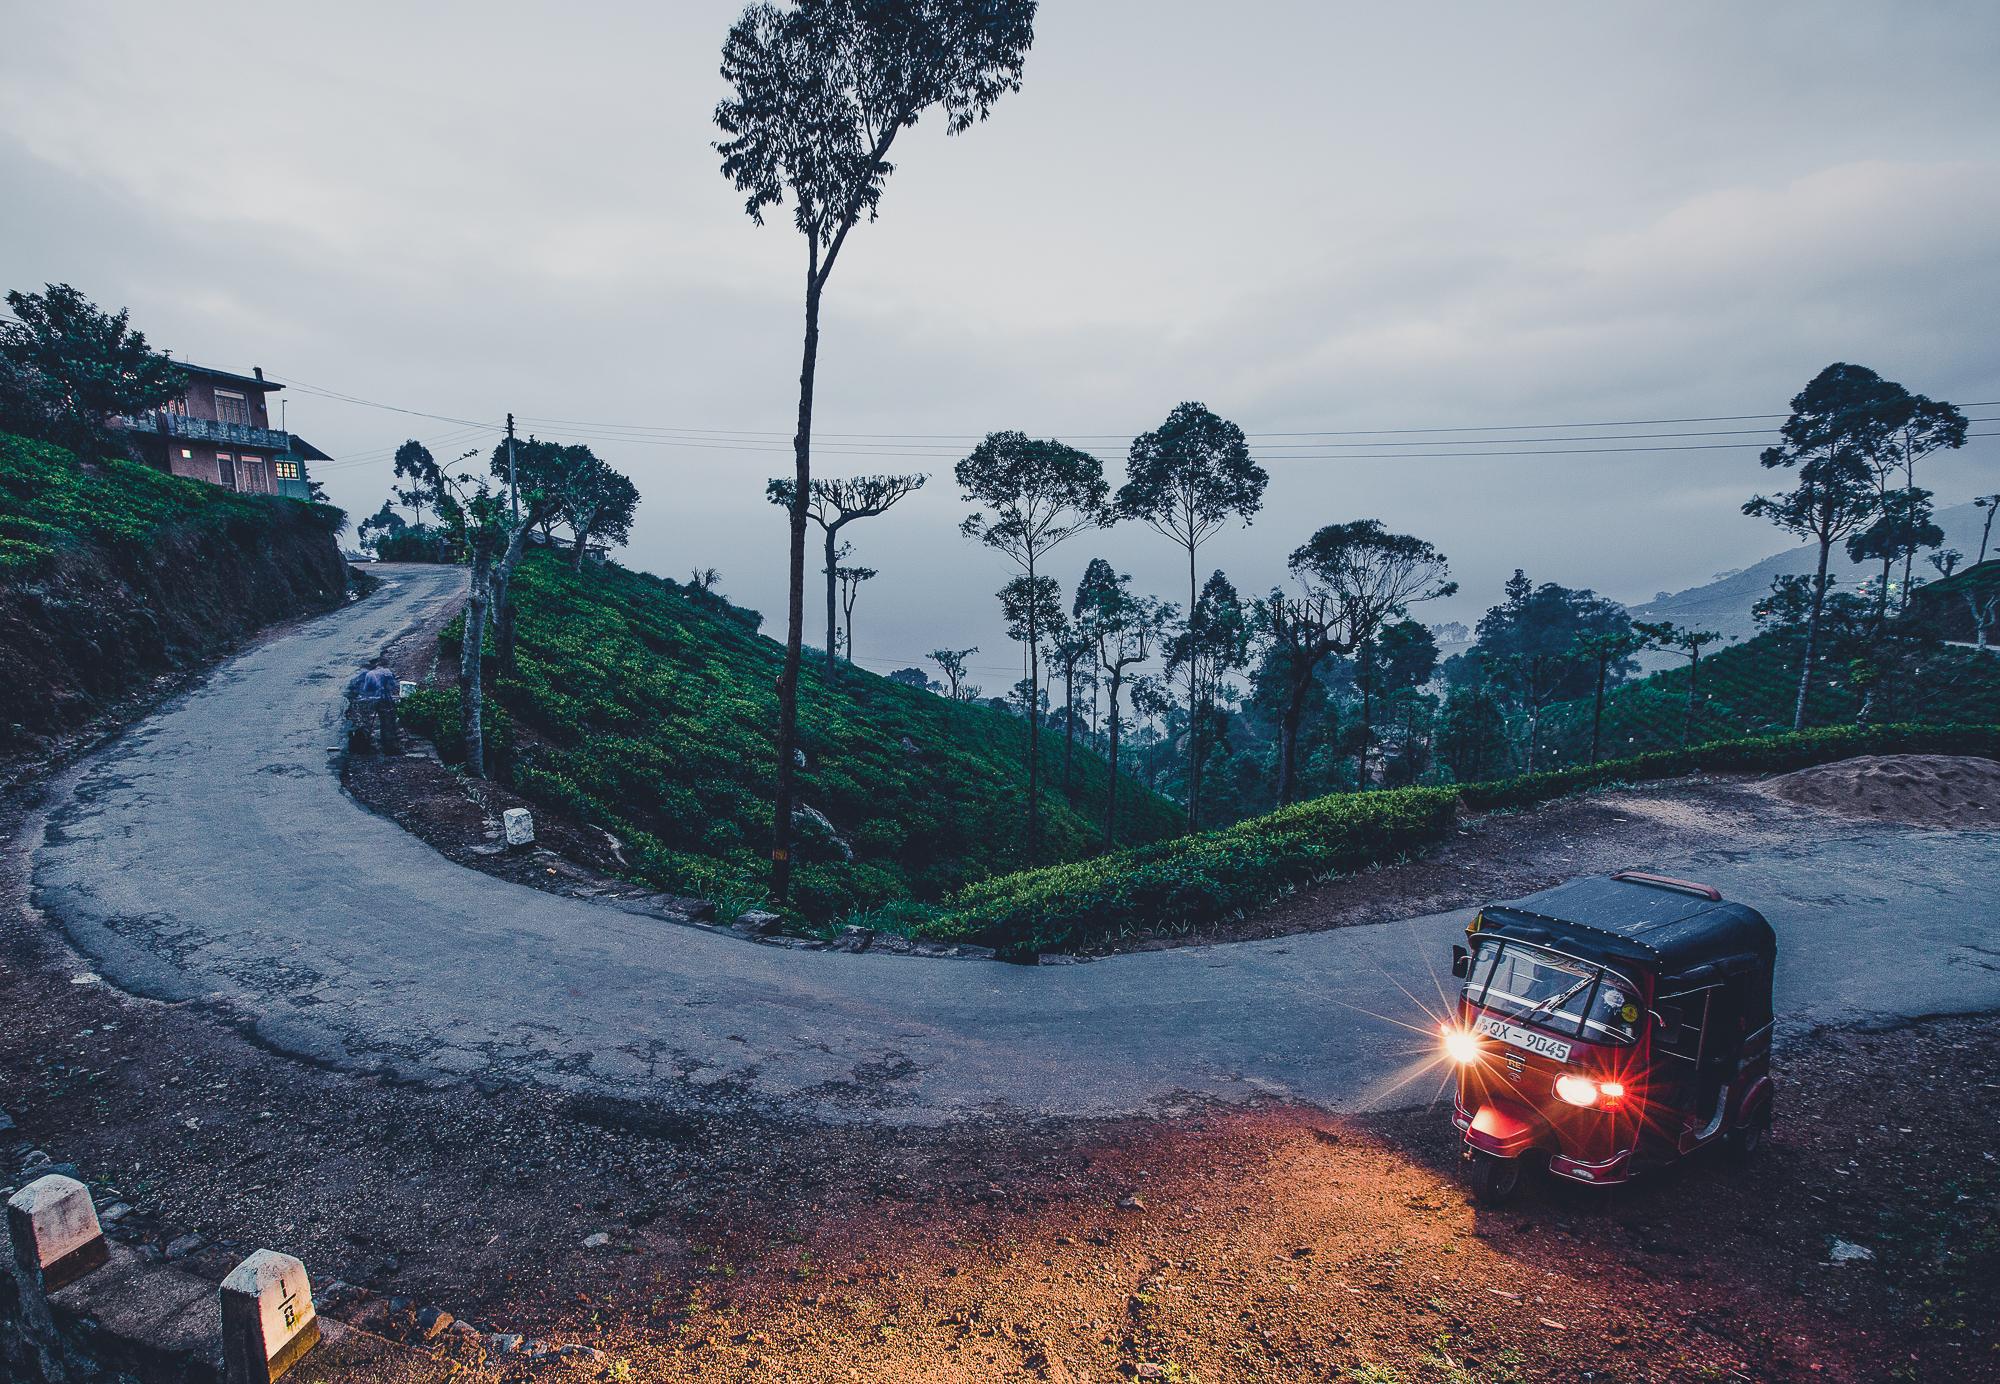 Tuk Tuk on the road at dusk